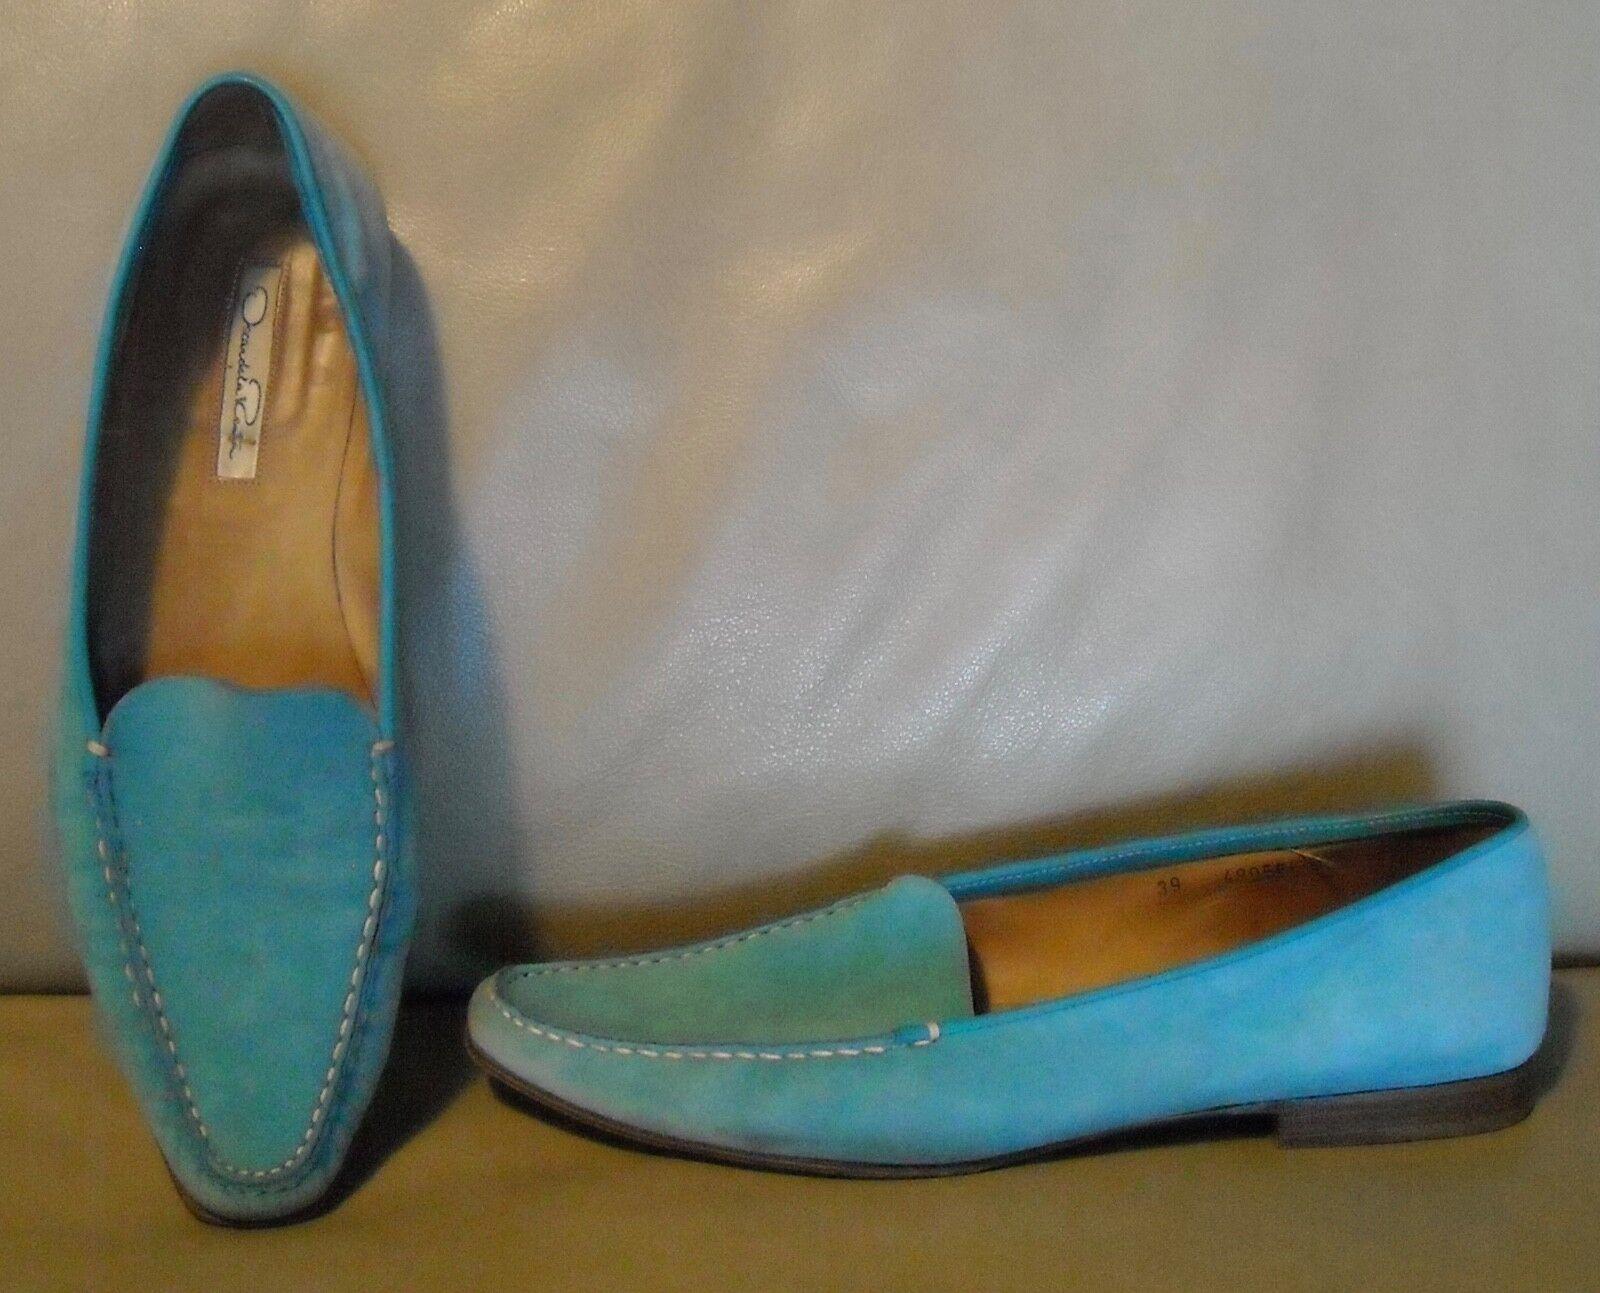 Oscar De La Renta Women's Suede Moccasin Loafers shoes Size 39  Turquoise bluee